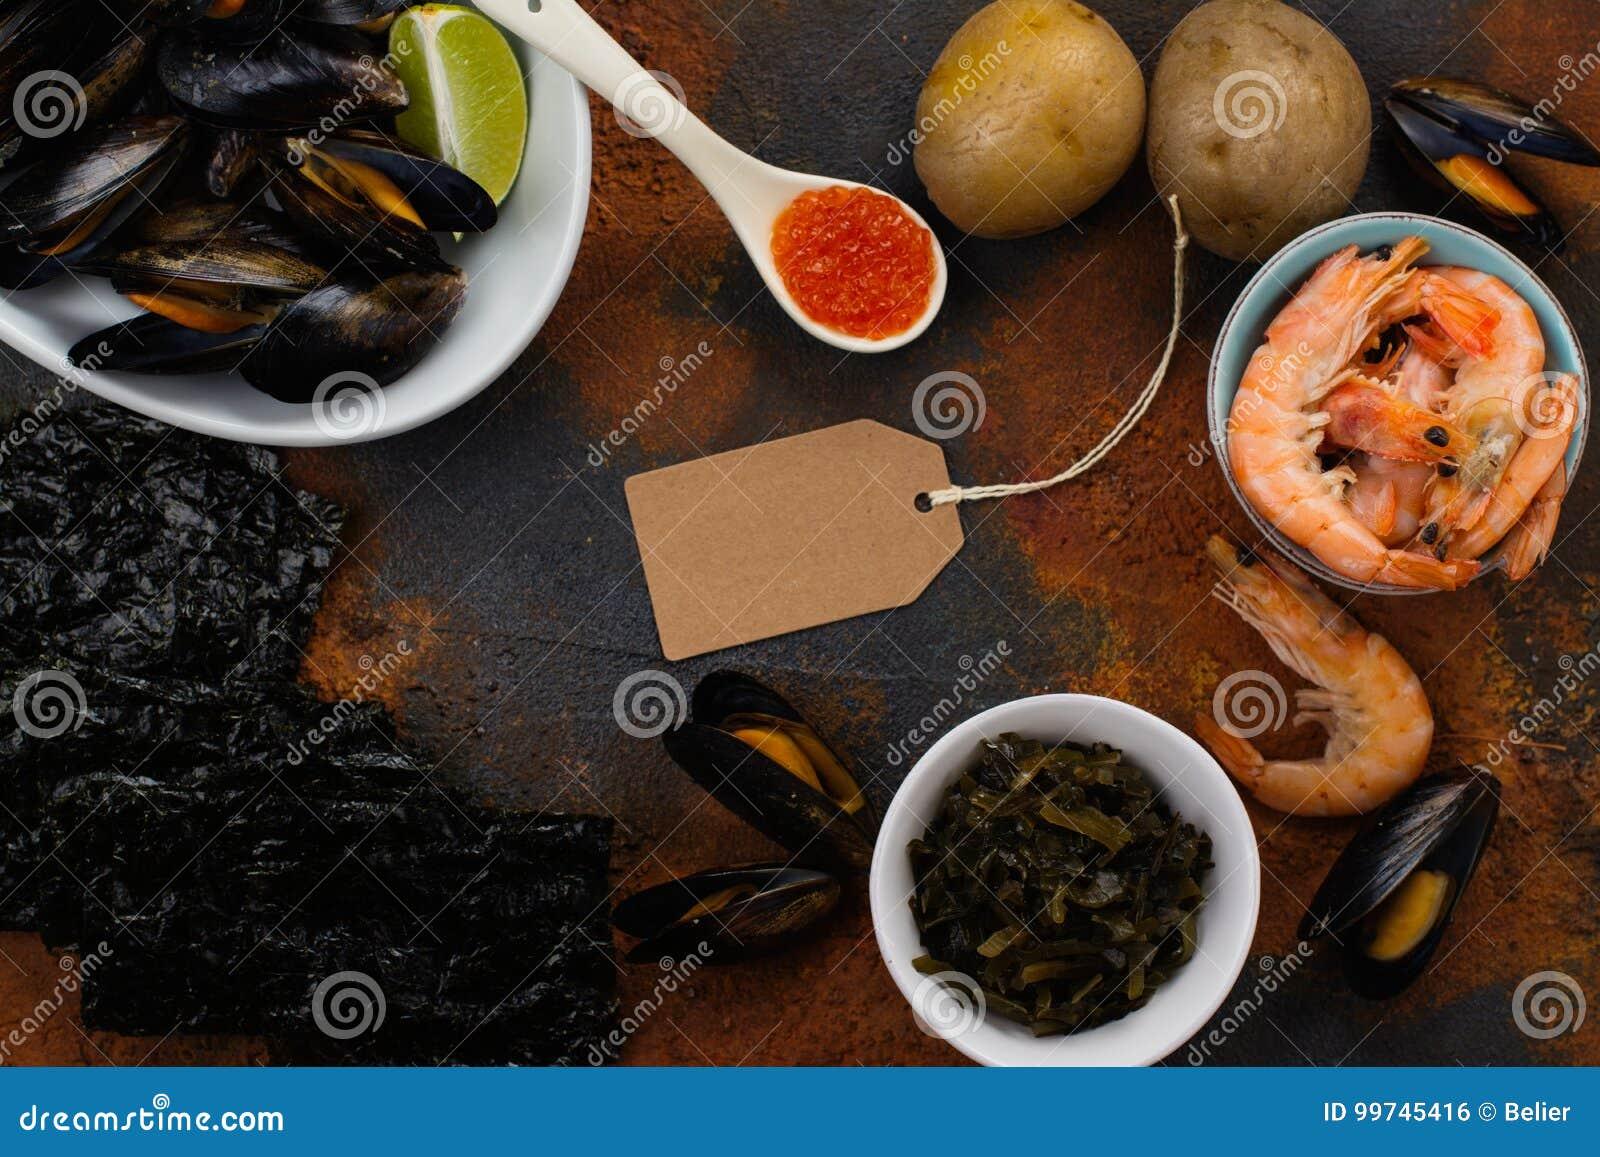 Food rich of iodine